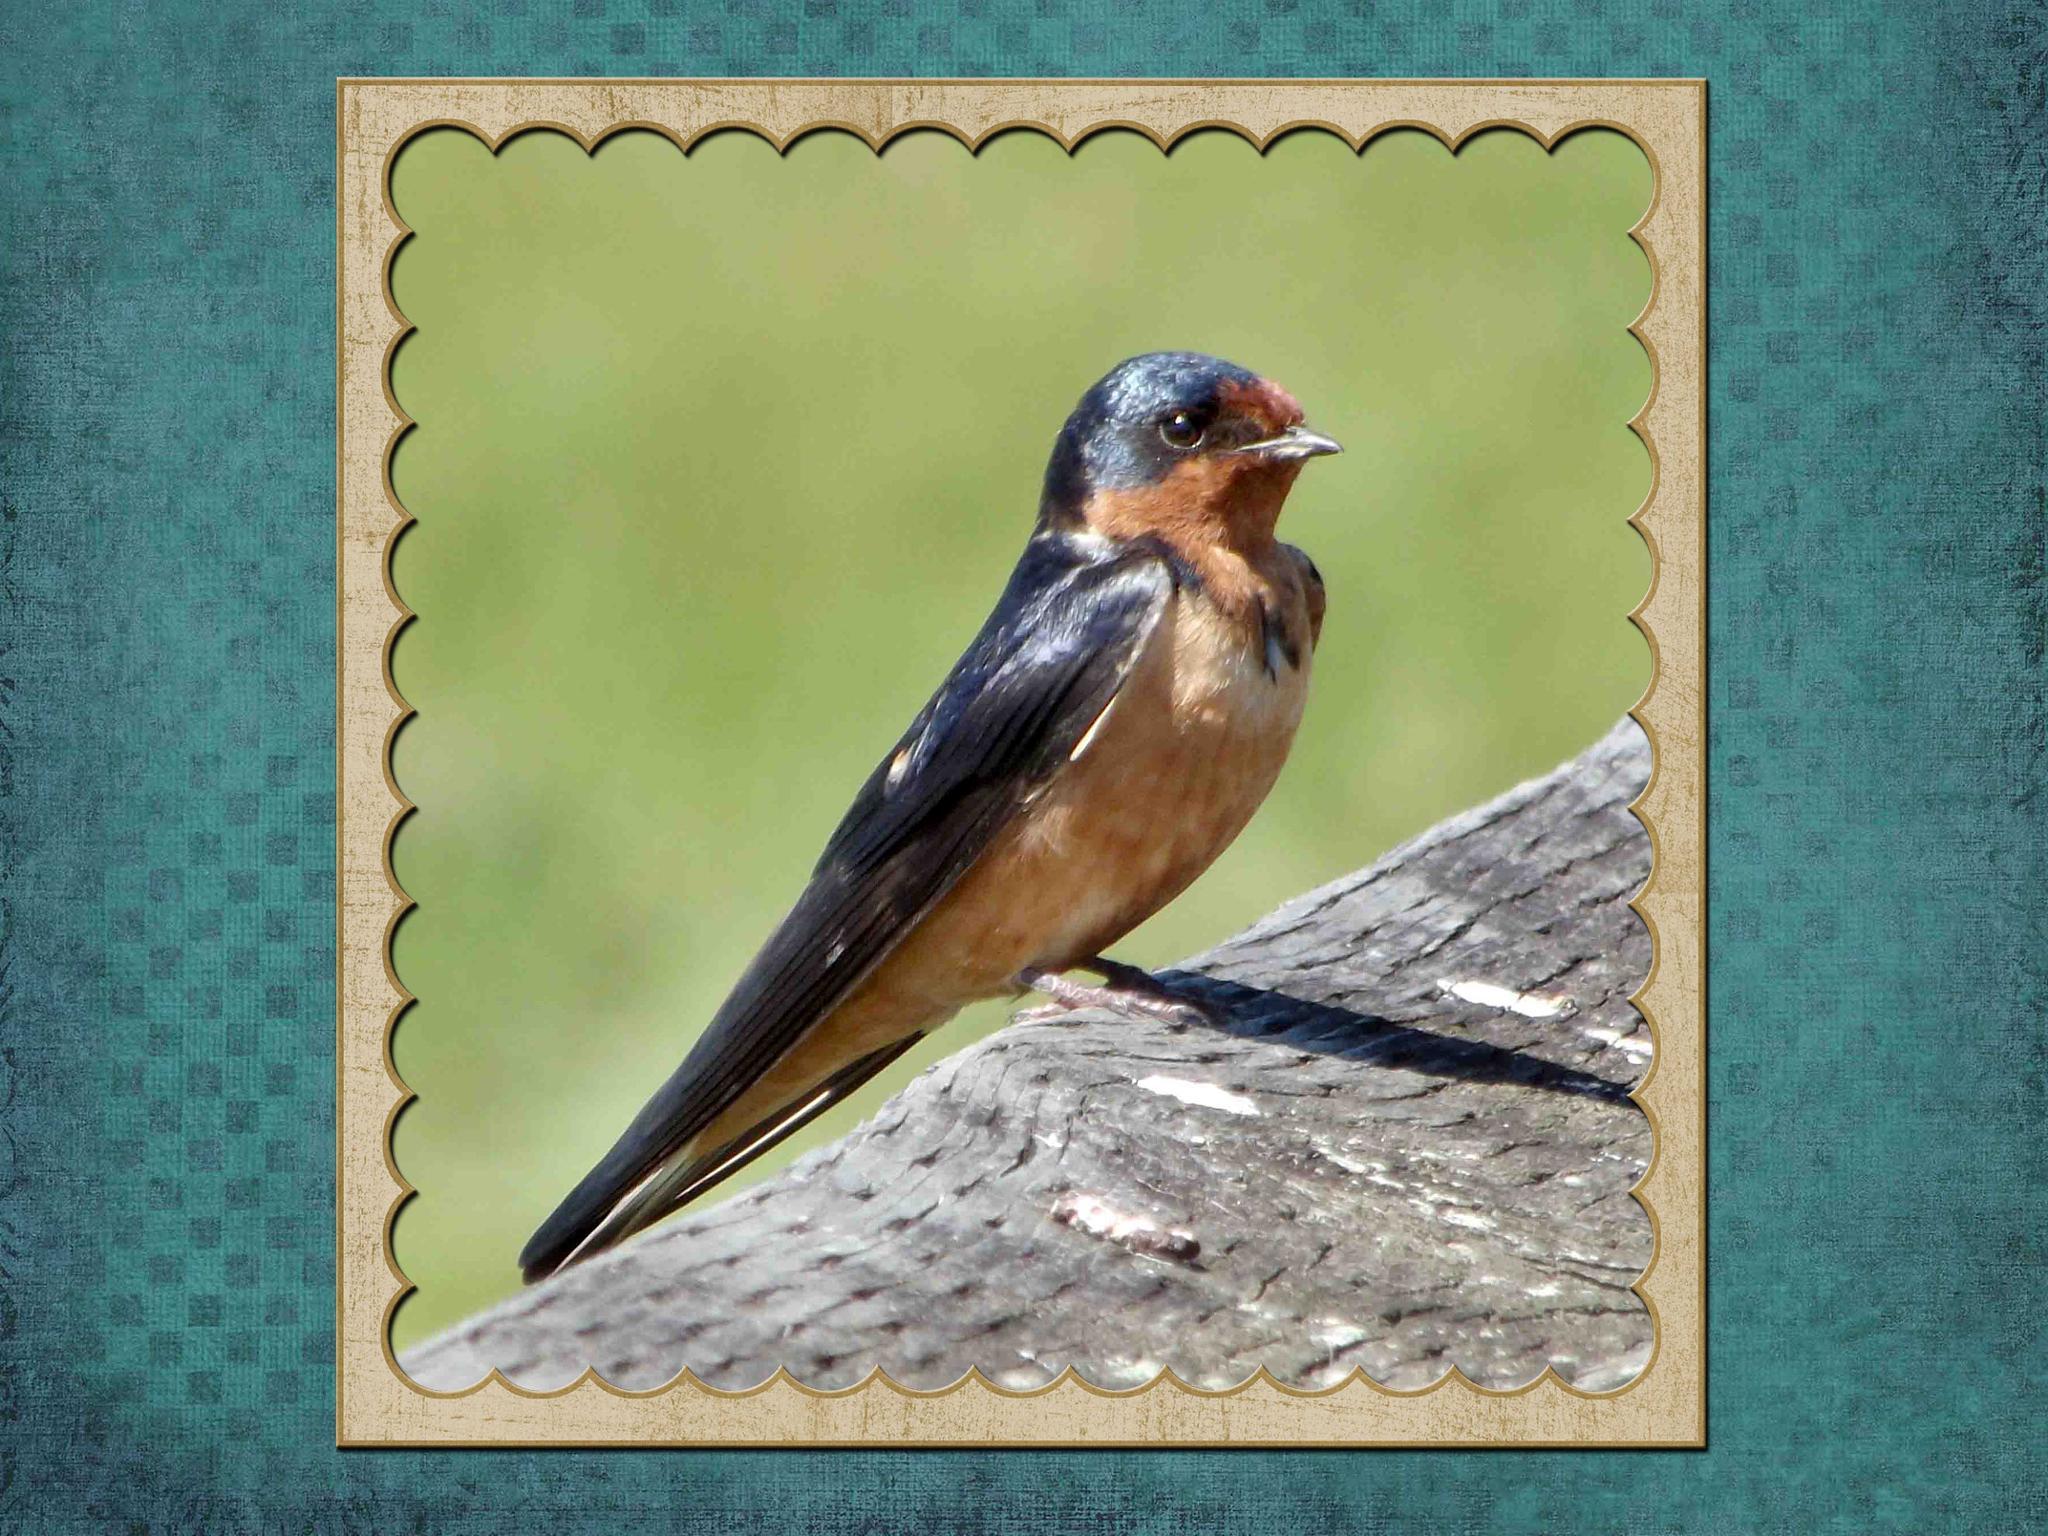 Swallow, Theler Wetlands, Belfair, WA framed  by 911photogirl